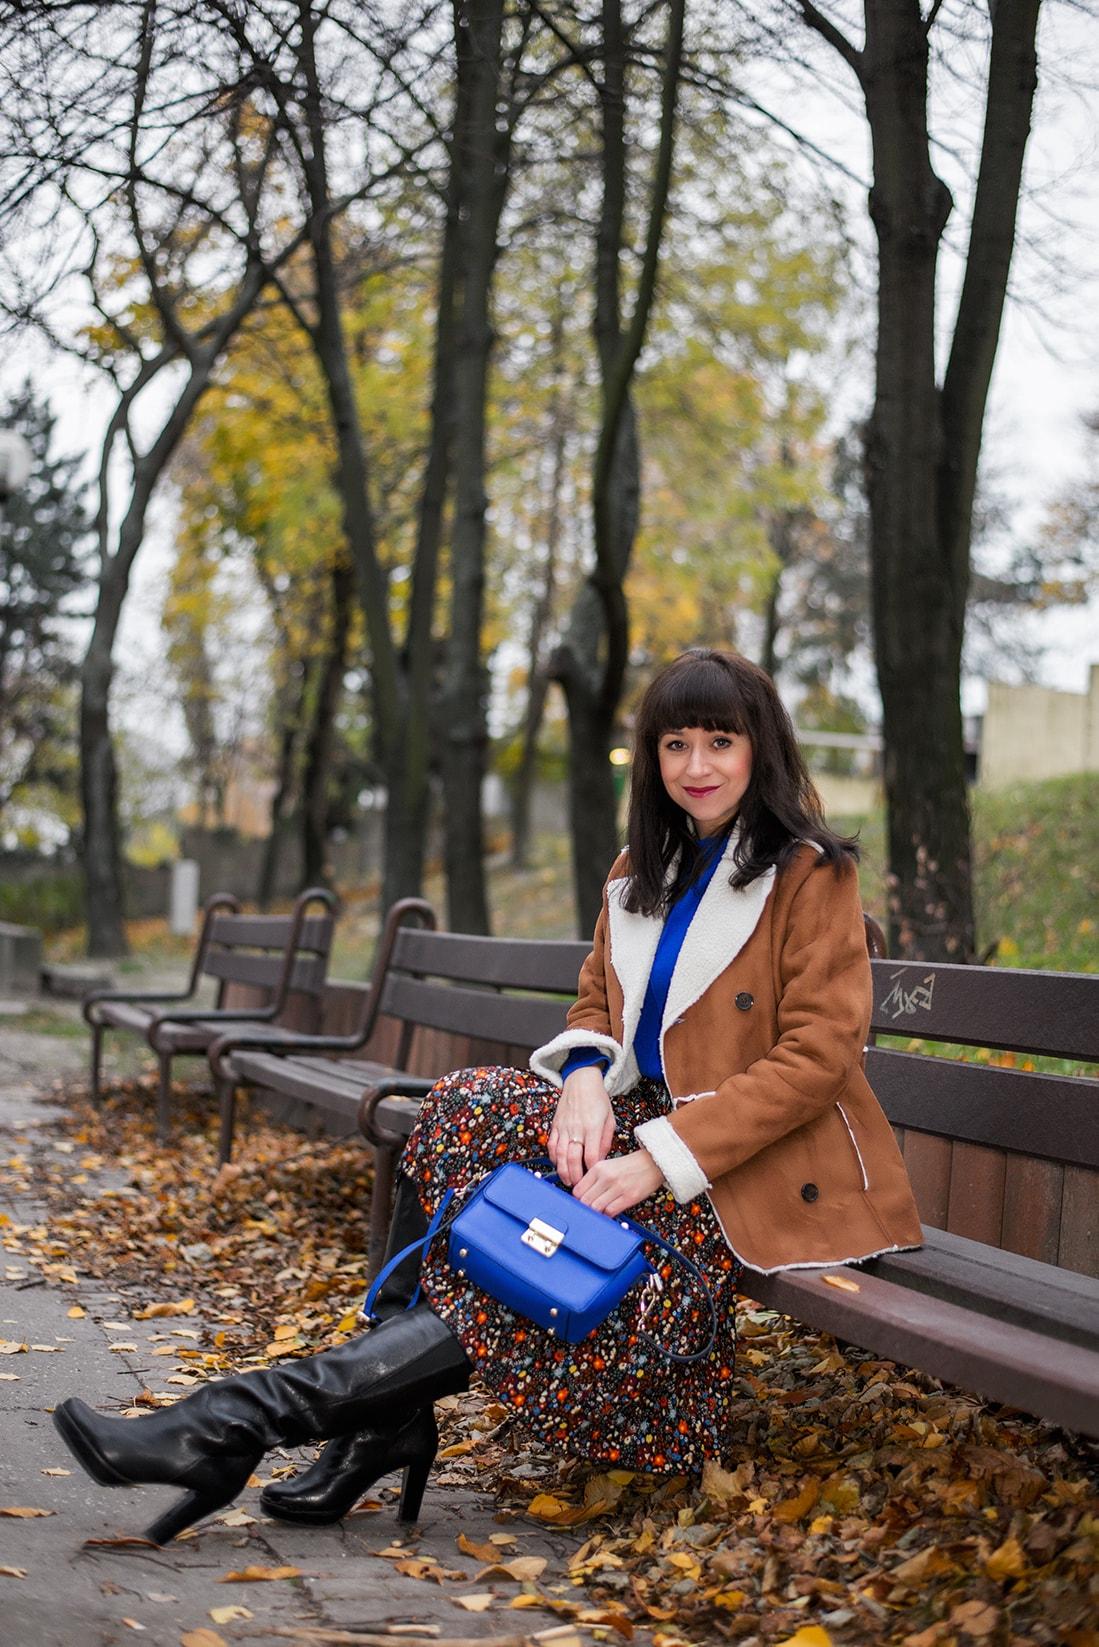 V NOWOM TARGU A SEMIŠOVÁ BUNDA NIELEN PRE BLOGERKU_Katharina-fashion is beautiful blog 5_Kvetovaná plisovaná sukňa_Kabelka JEJ_Katarína Jakubčová_Fashion blogerka